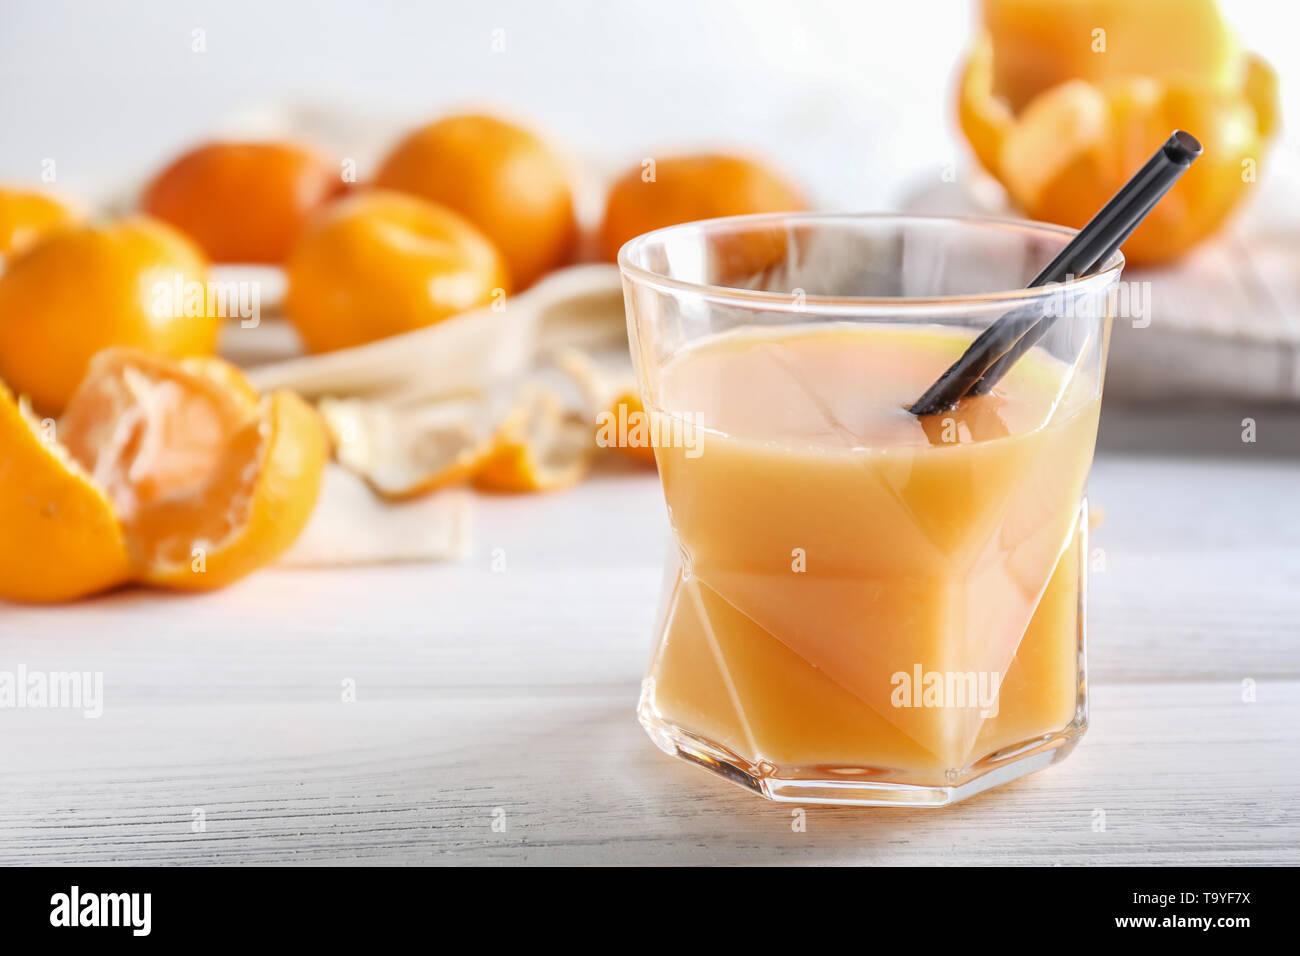 Glass of sweet tangerine juice on table - Stock Image